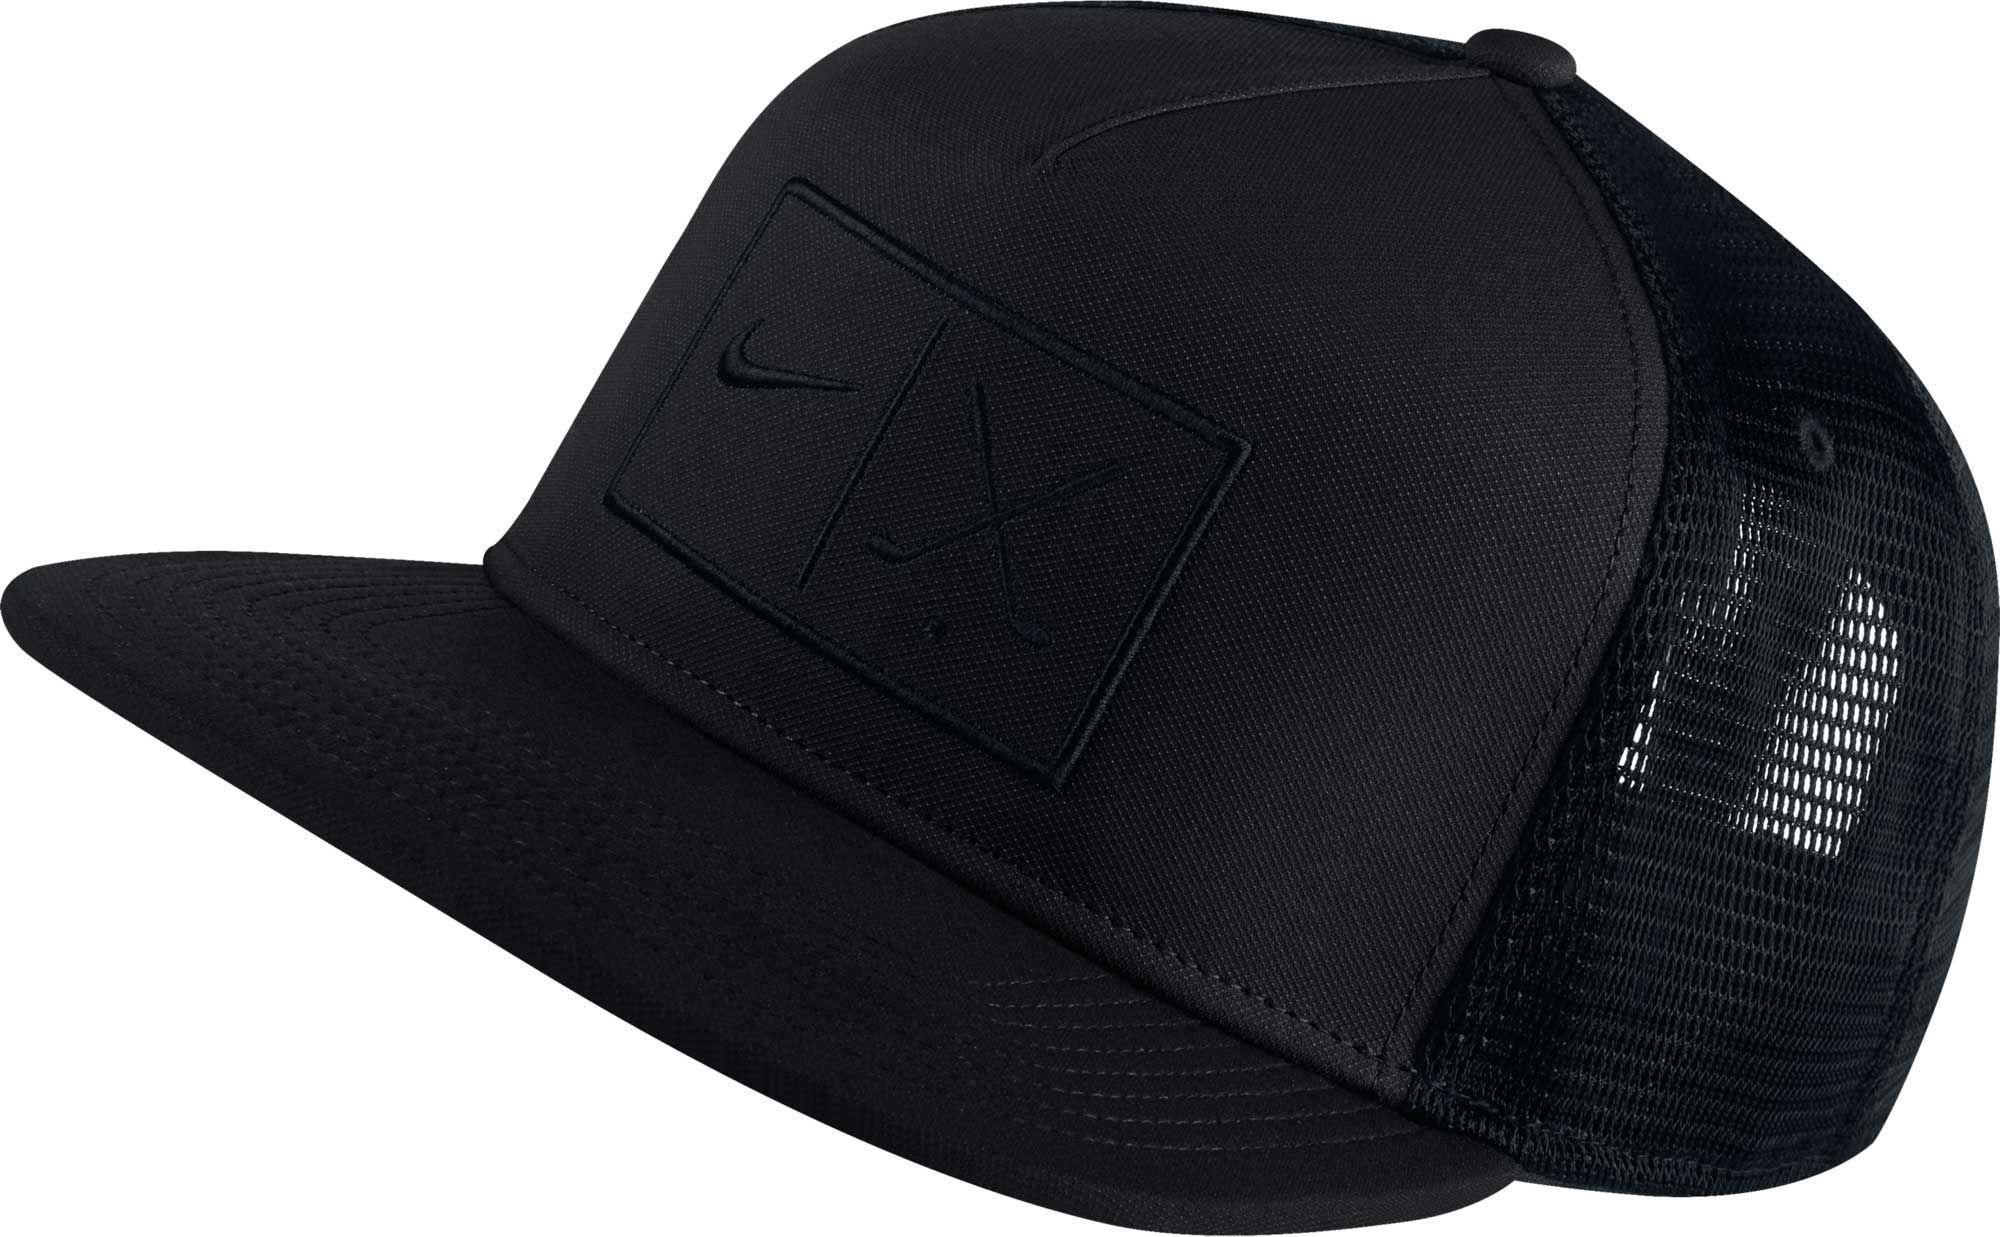 Lyst - Nike True Novelty Golf Hat in Black for Men 0e1f1db6121